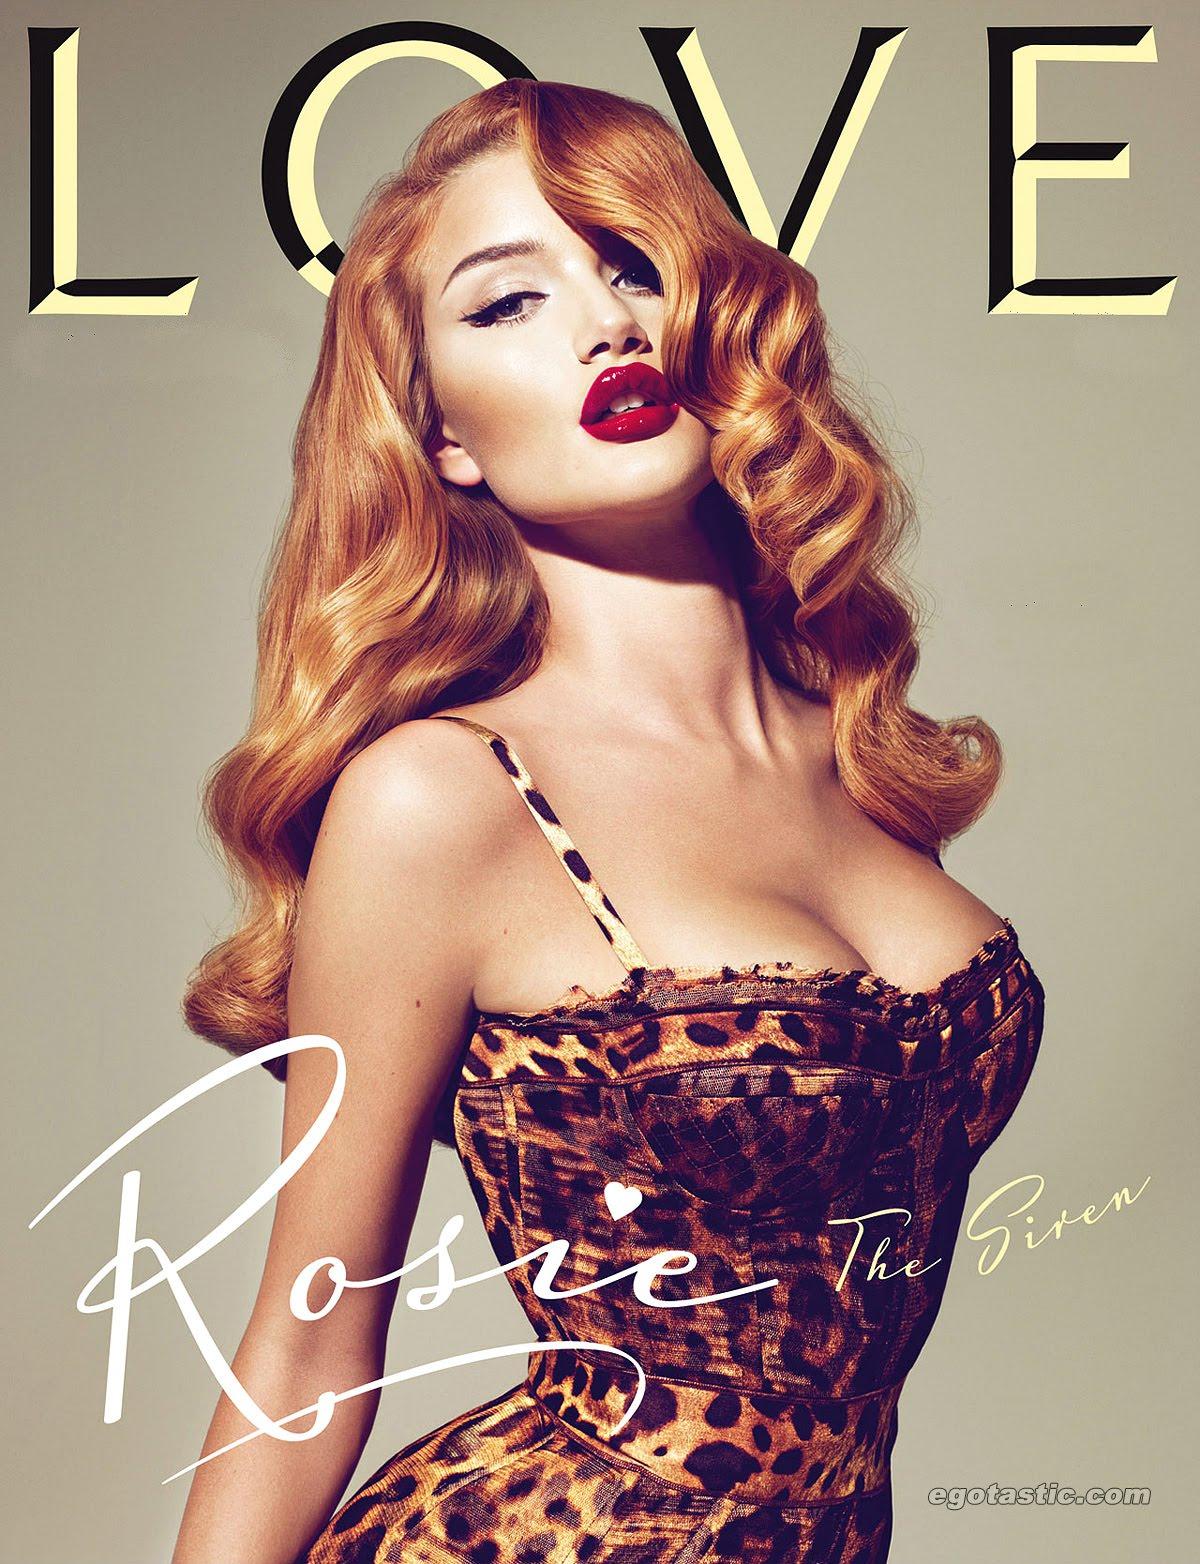 http://4.bp.blogspot.com/_WX0bJnkHIoI/THw45Tn0uiI/AAAAAAAAAfg/BP7ksoFGjR0/s1600/rosie-huntington-whiteley-love-issue4-01.jpg